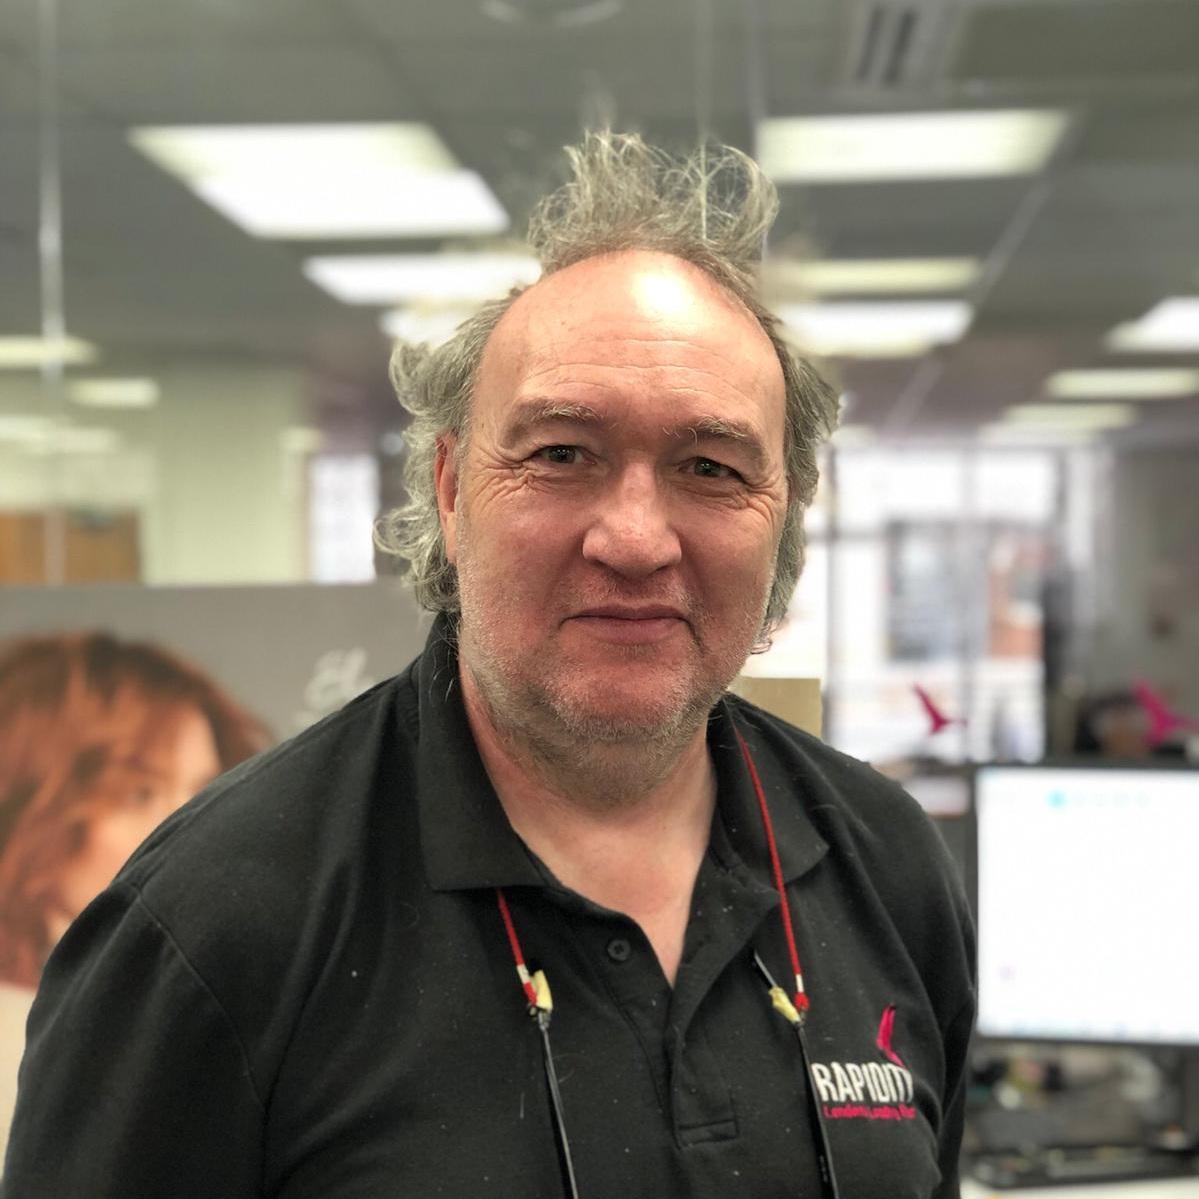 Alan Benson    Display Operator